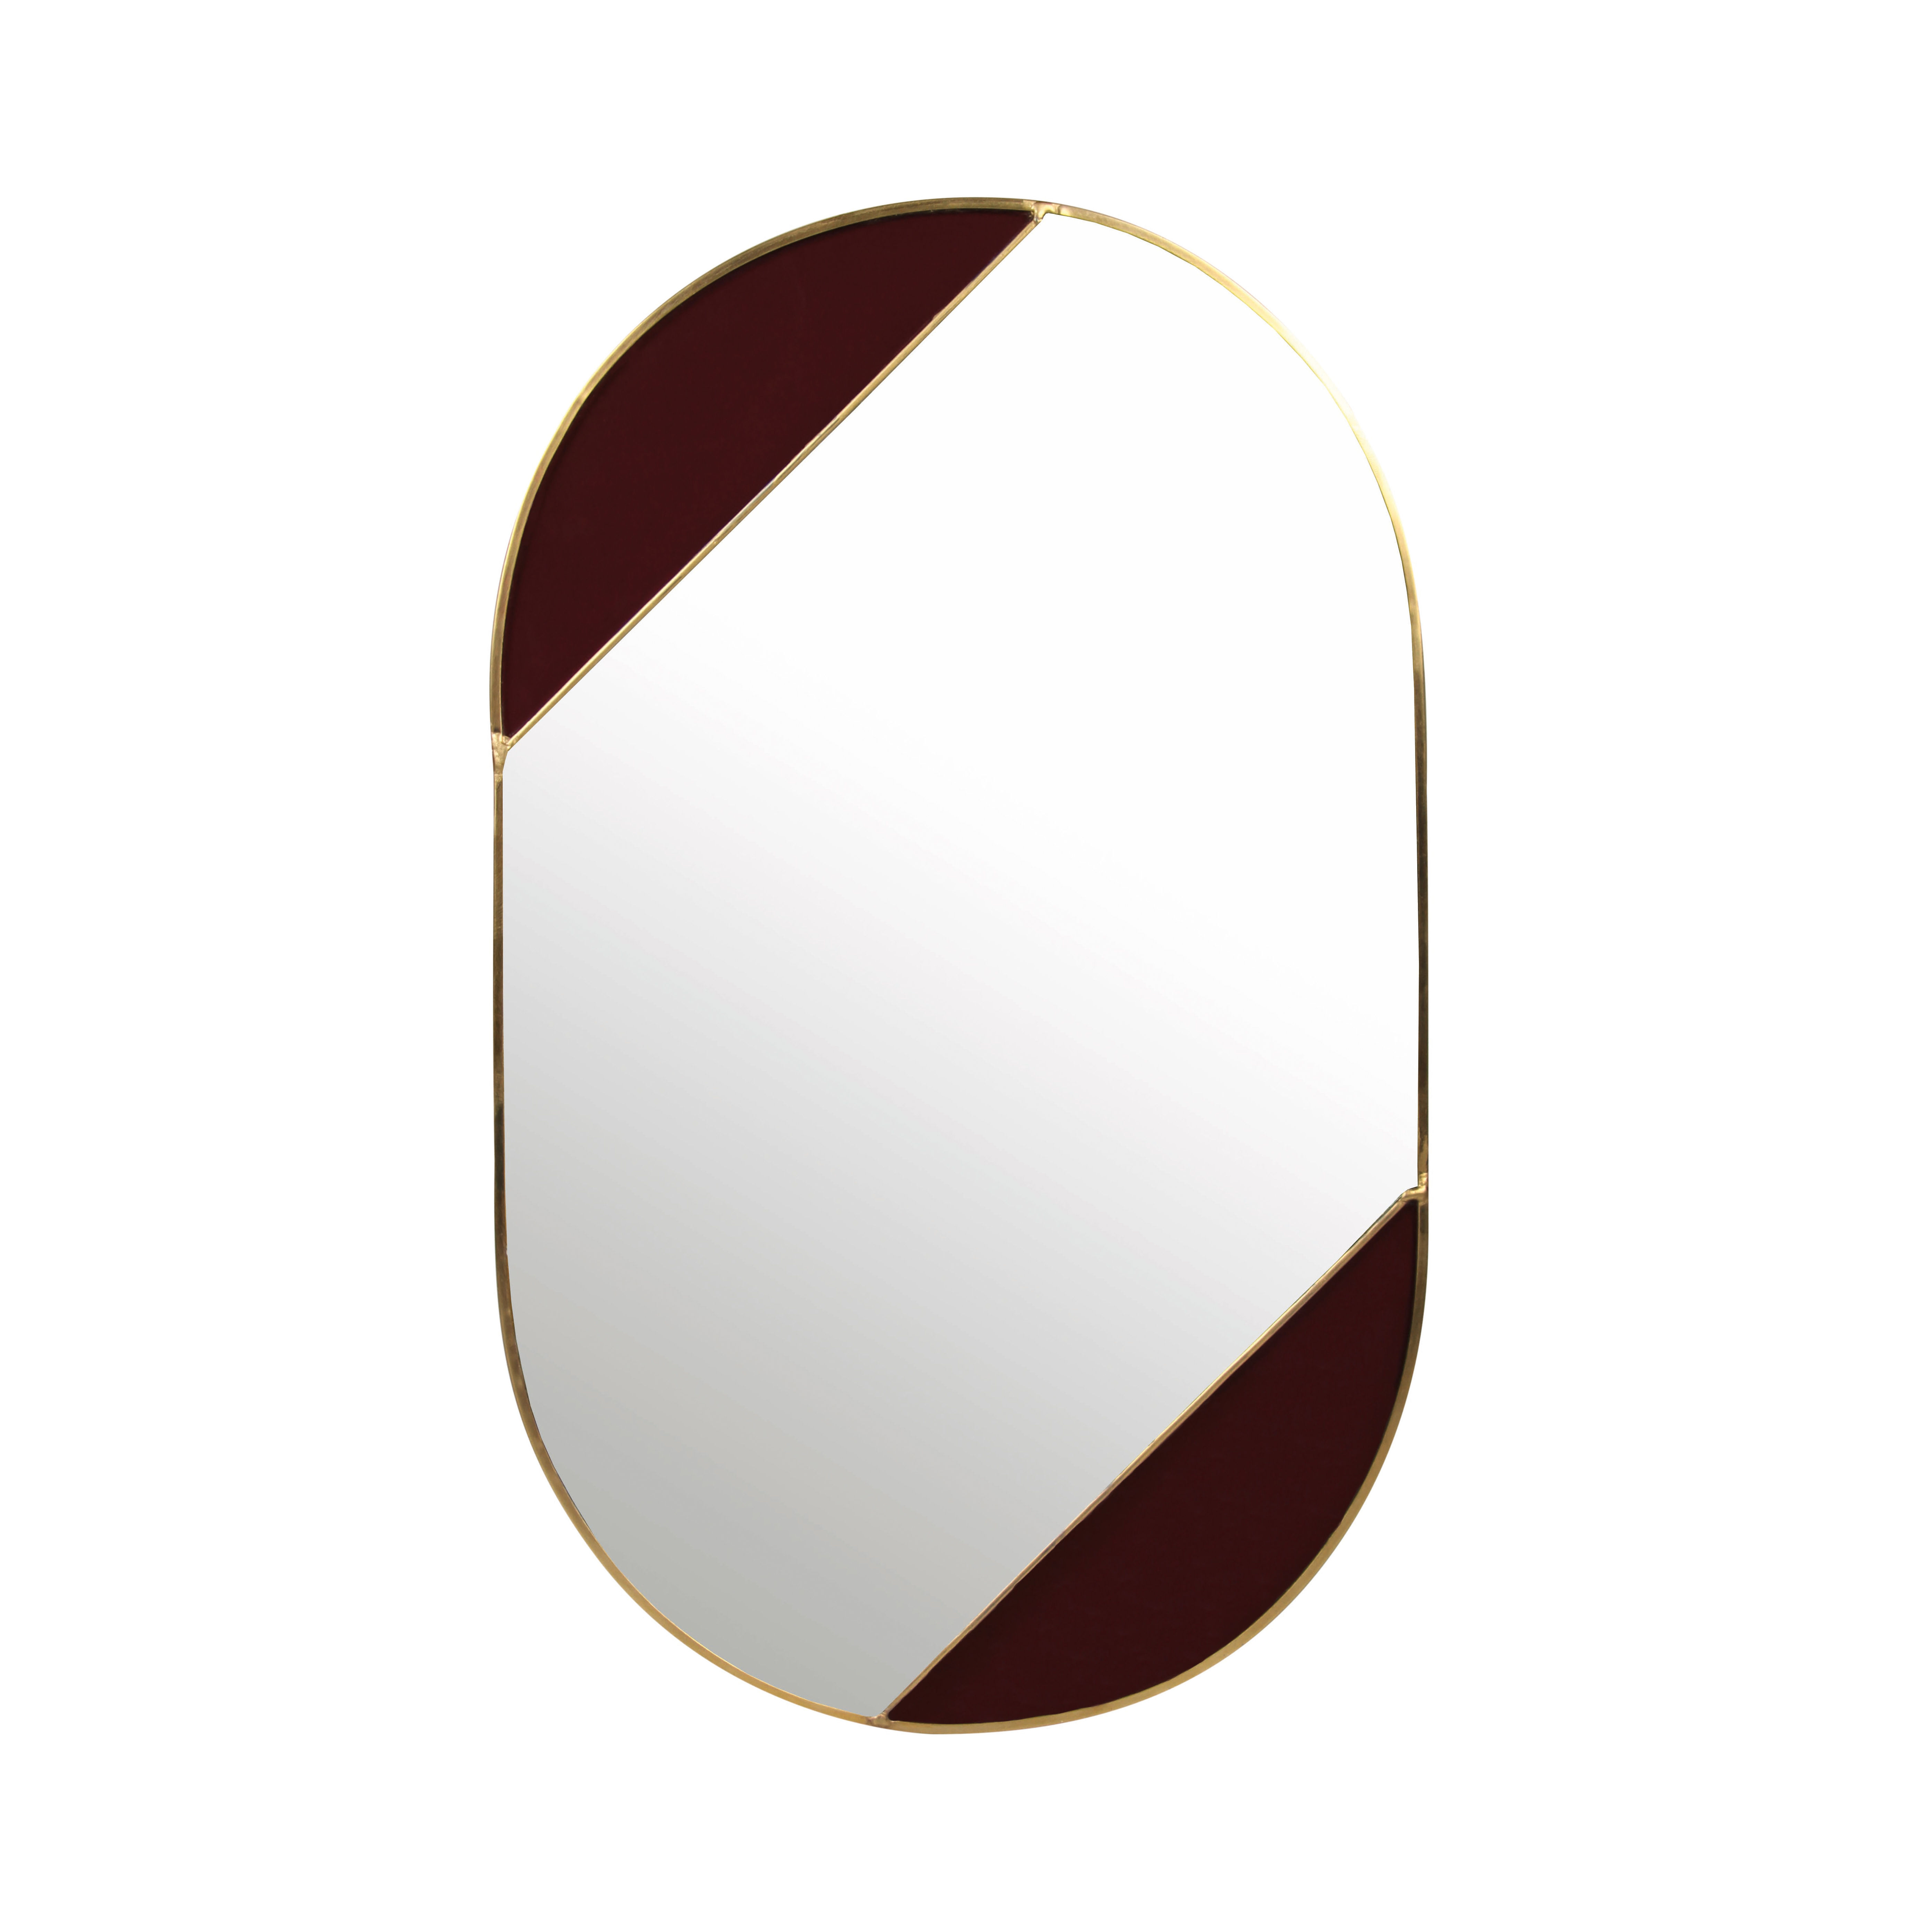 Dekoration - Spiegel - Oval Wandspiegel / 24,5 x 40 cm - & klevering - Oval / violett - Glas, Metall